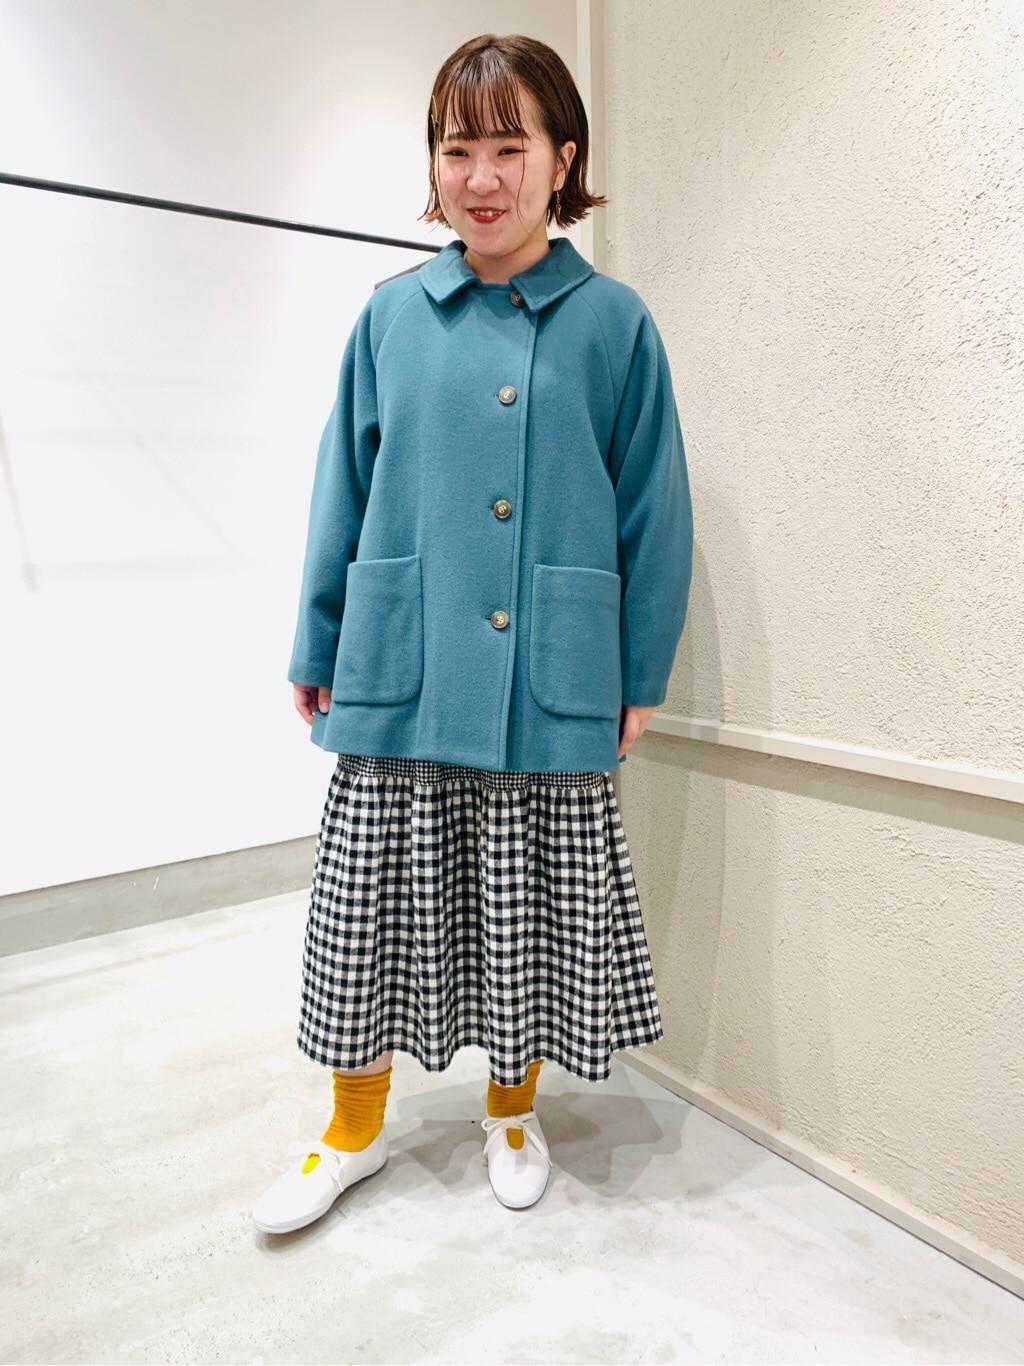 chambre de charme 横浜ジョイナス 身長:155cm 2020.09.28